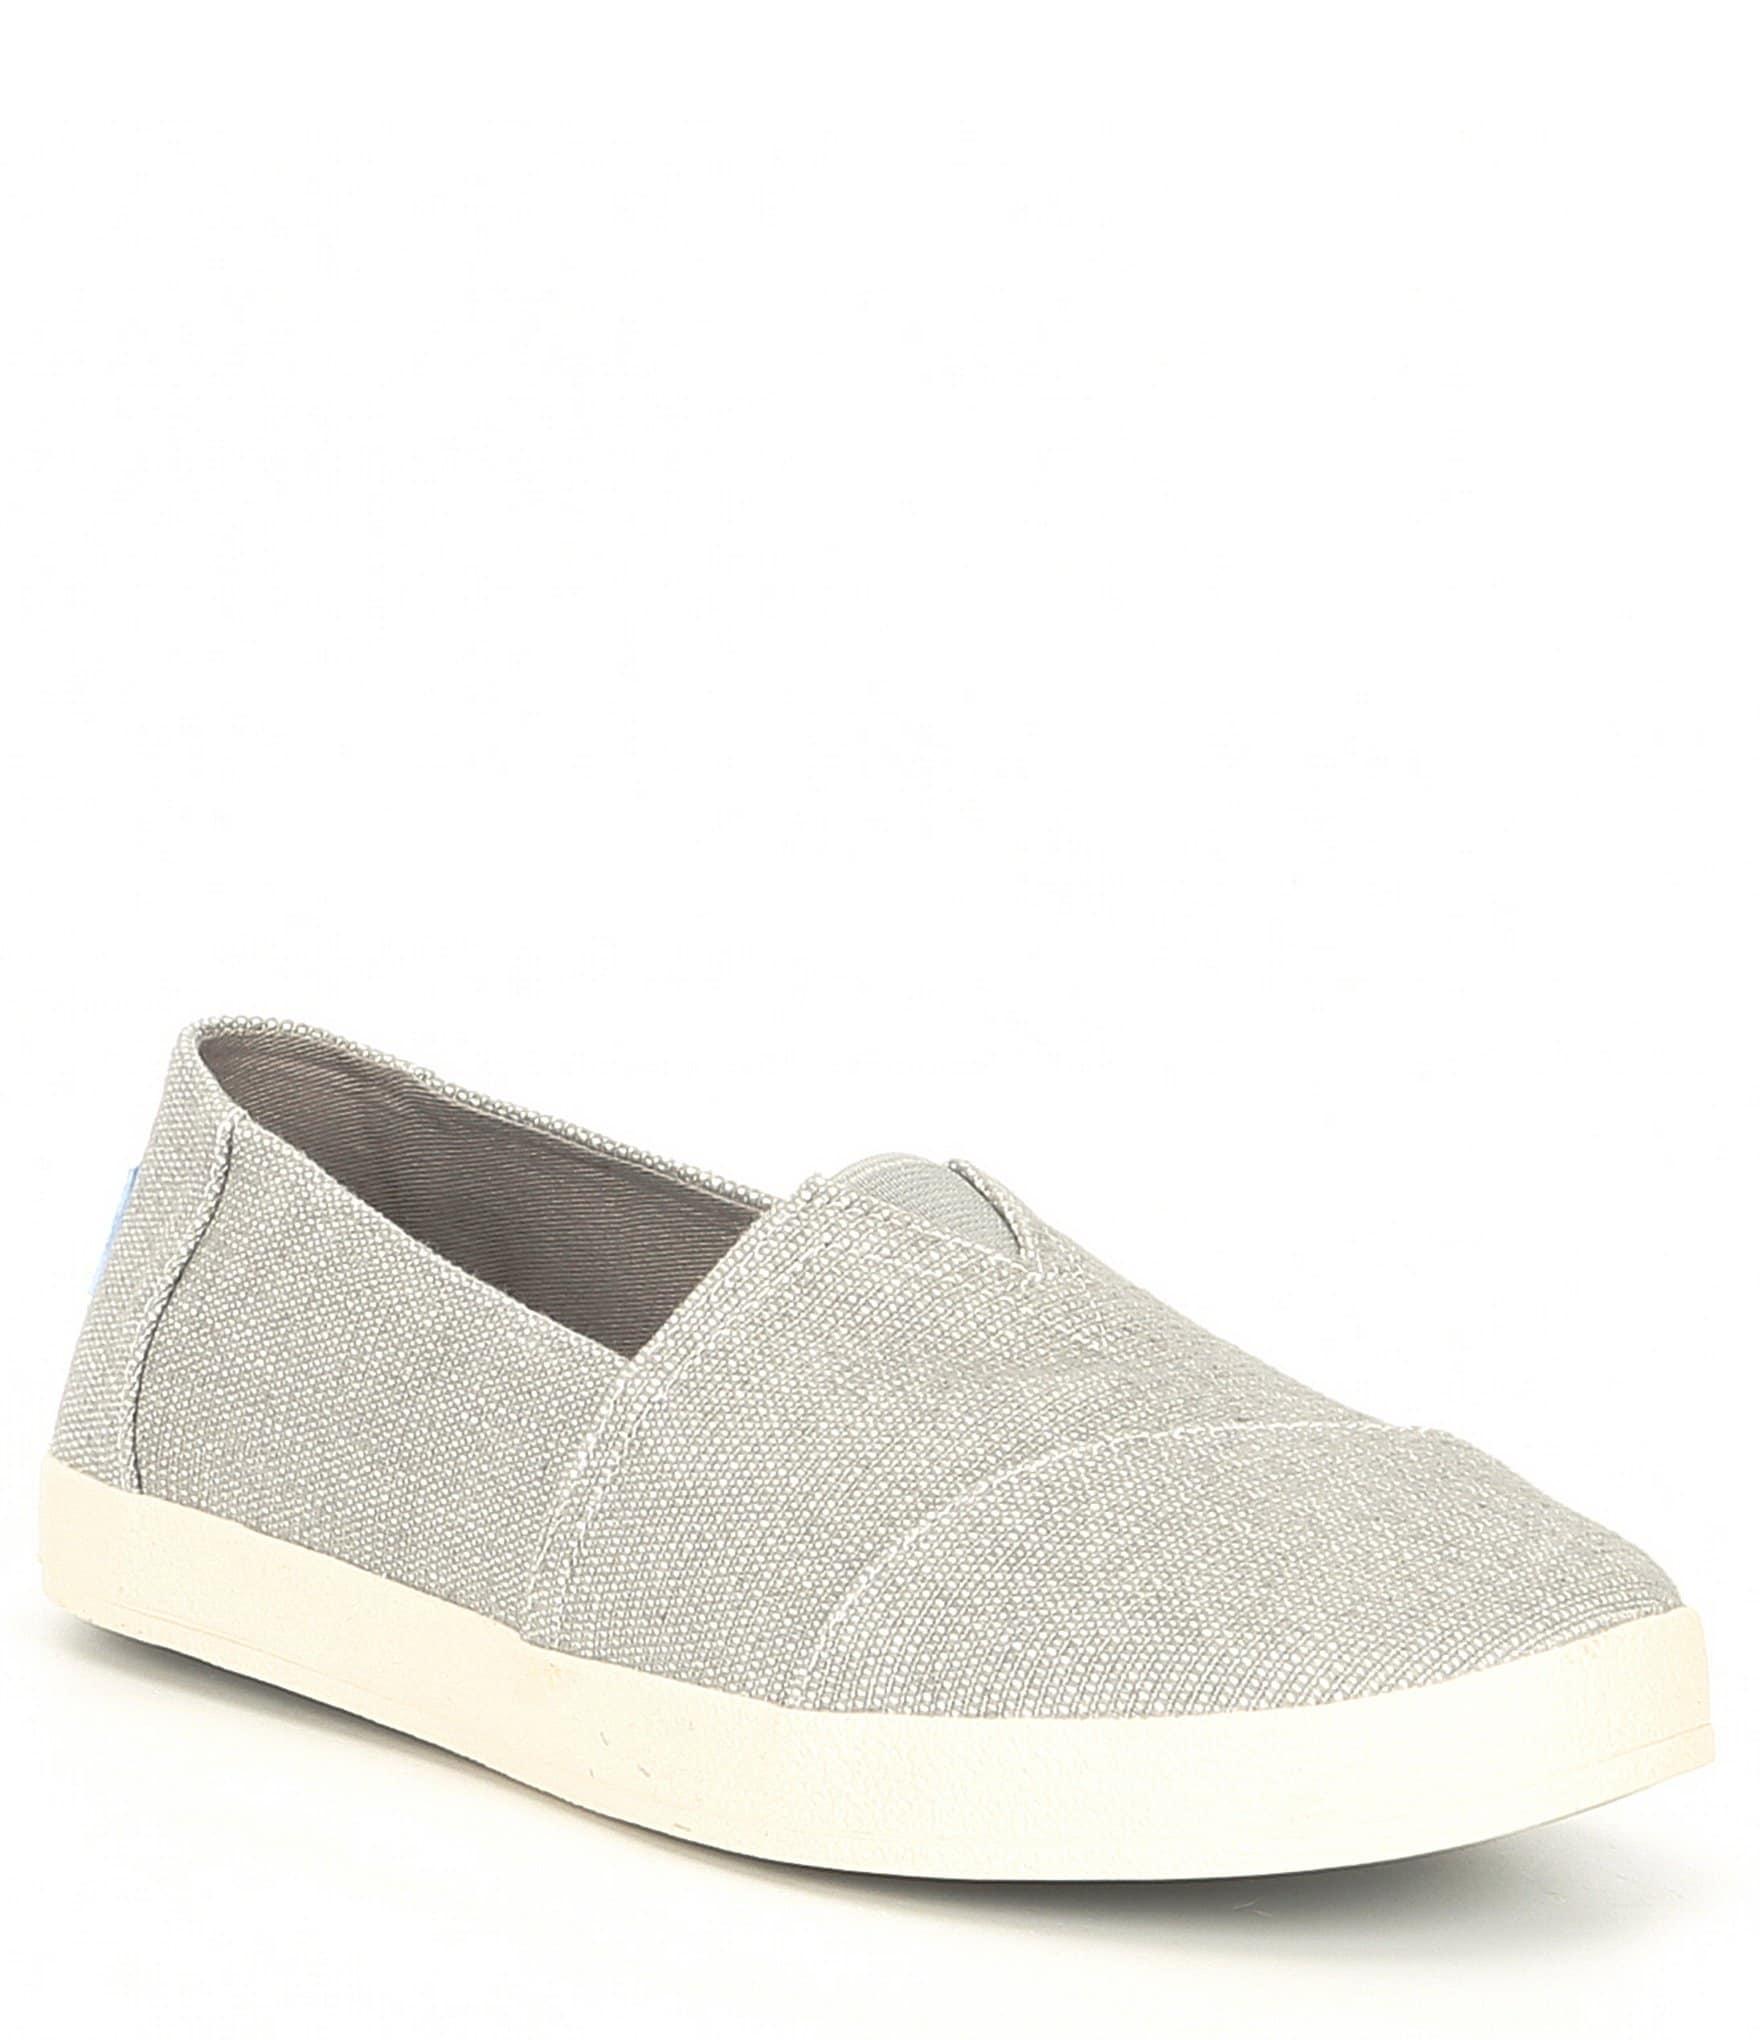 TOMS Avalon Canvas Slip-On Shoes